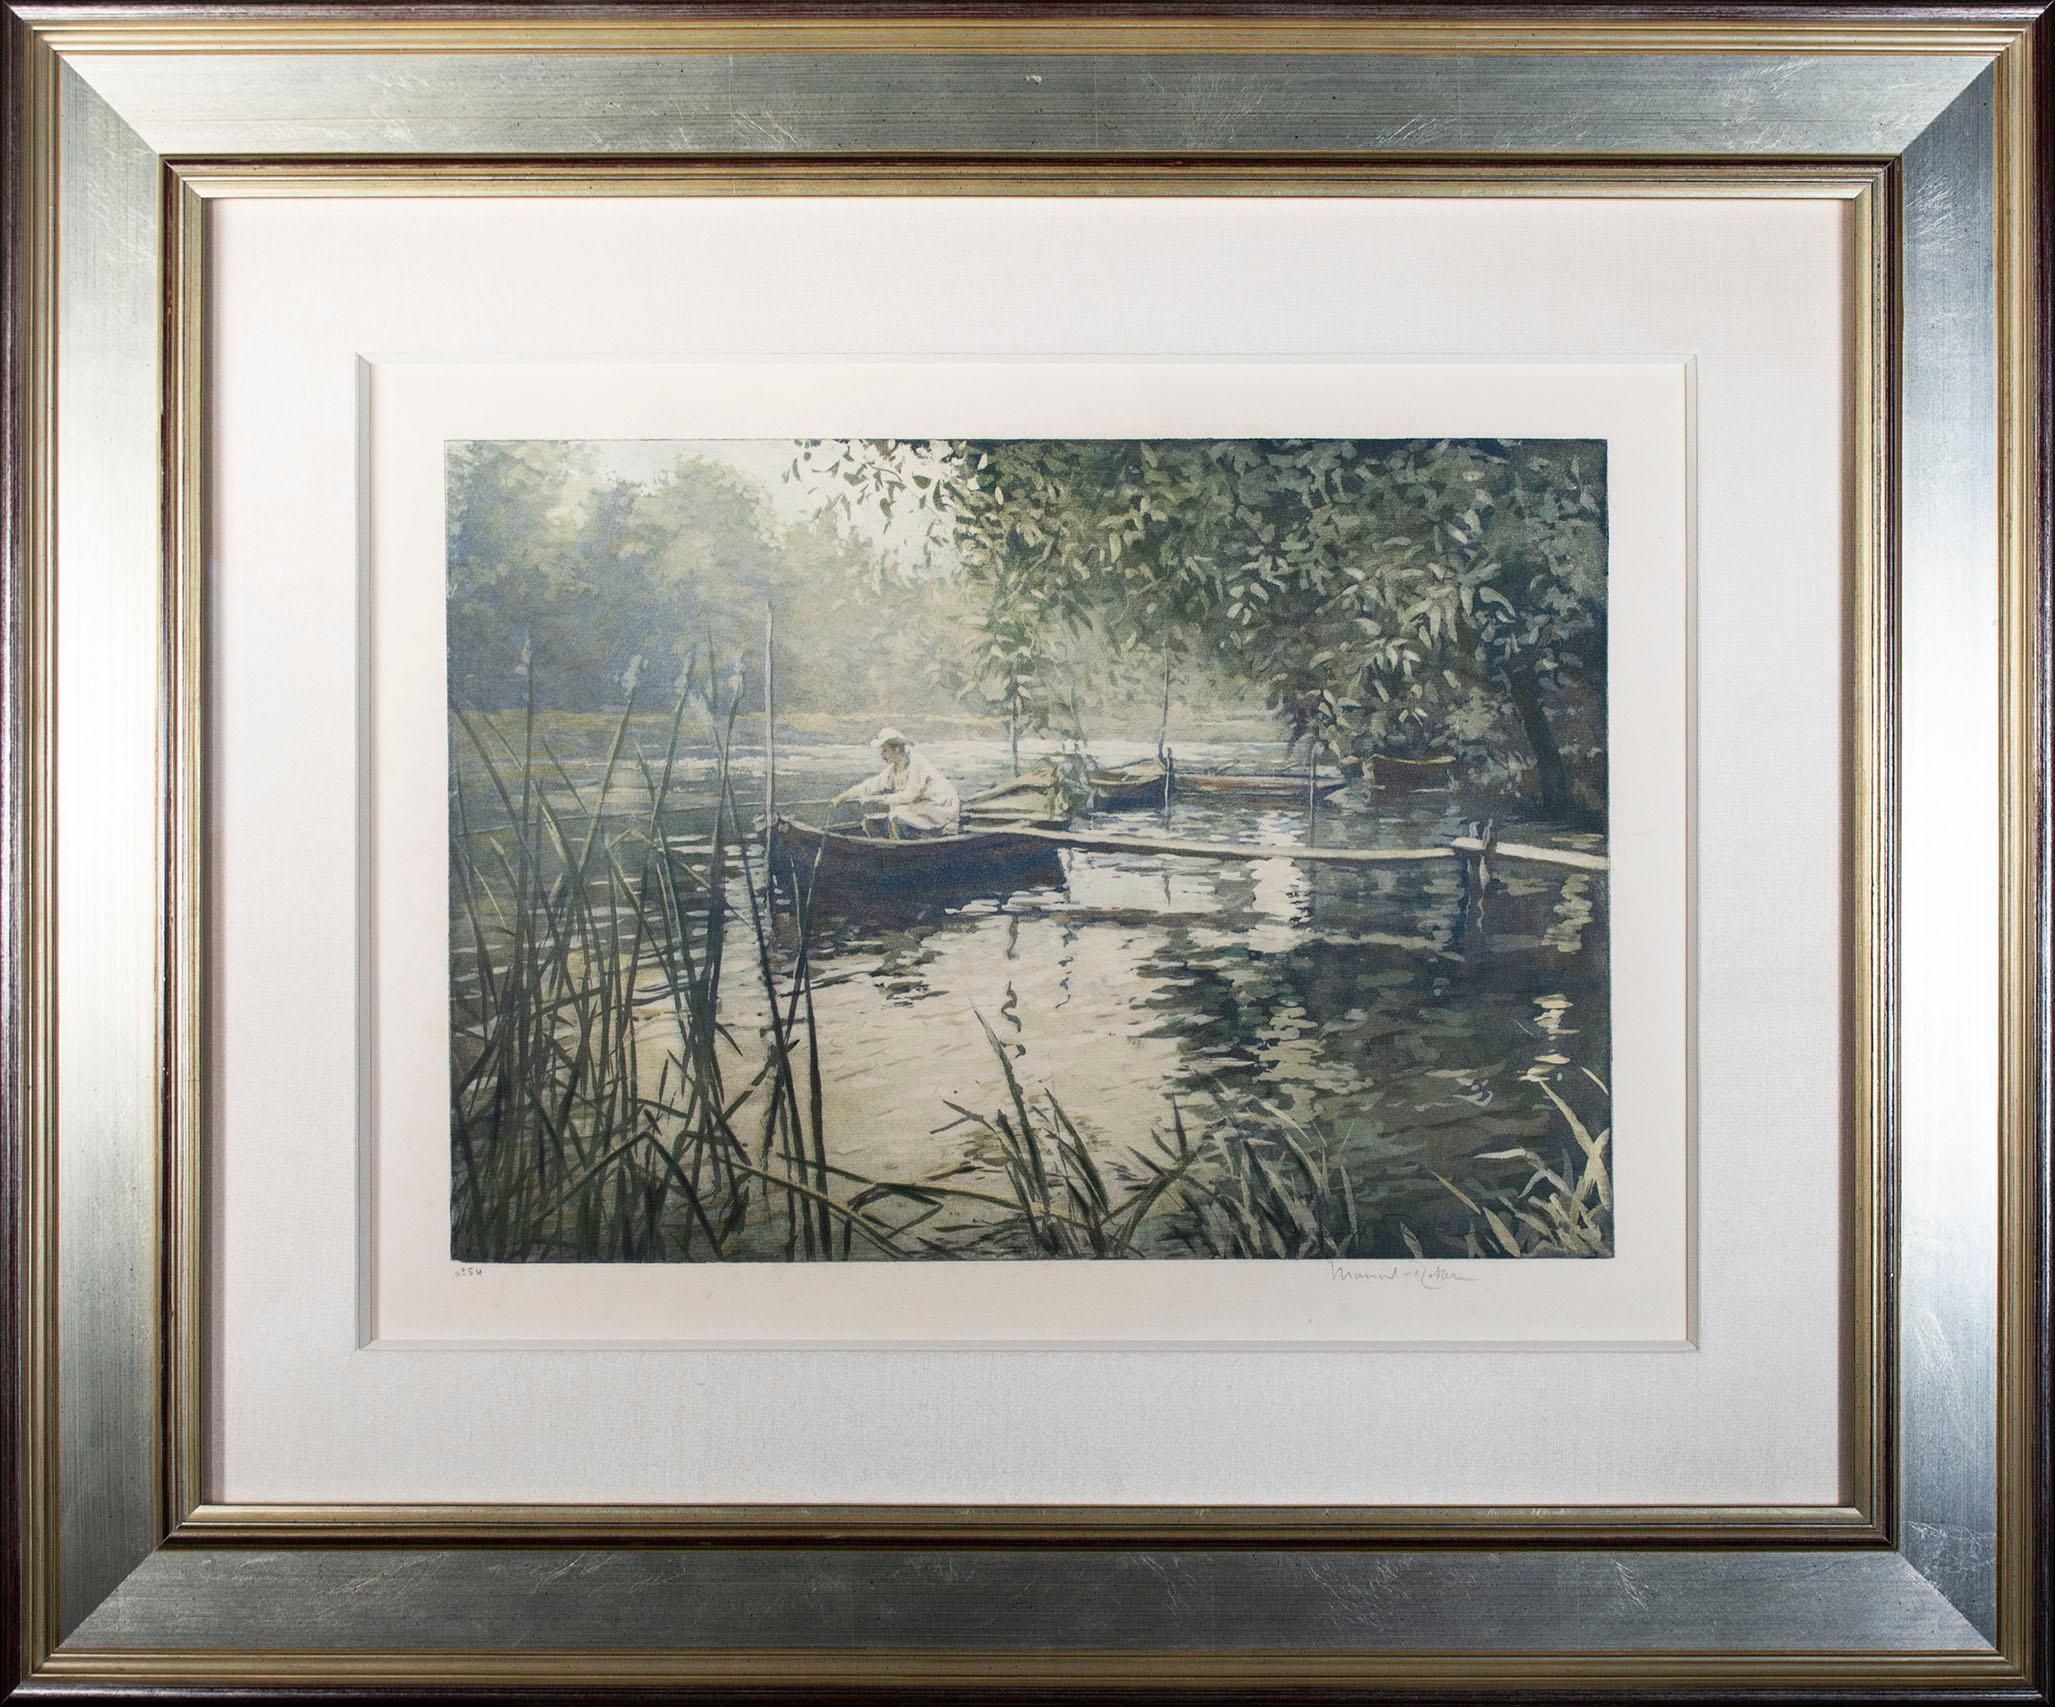 'Le Pecheur,' original Impressionist aquatint signed by Manuel Robbe